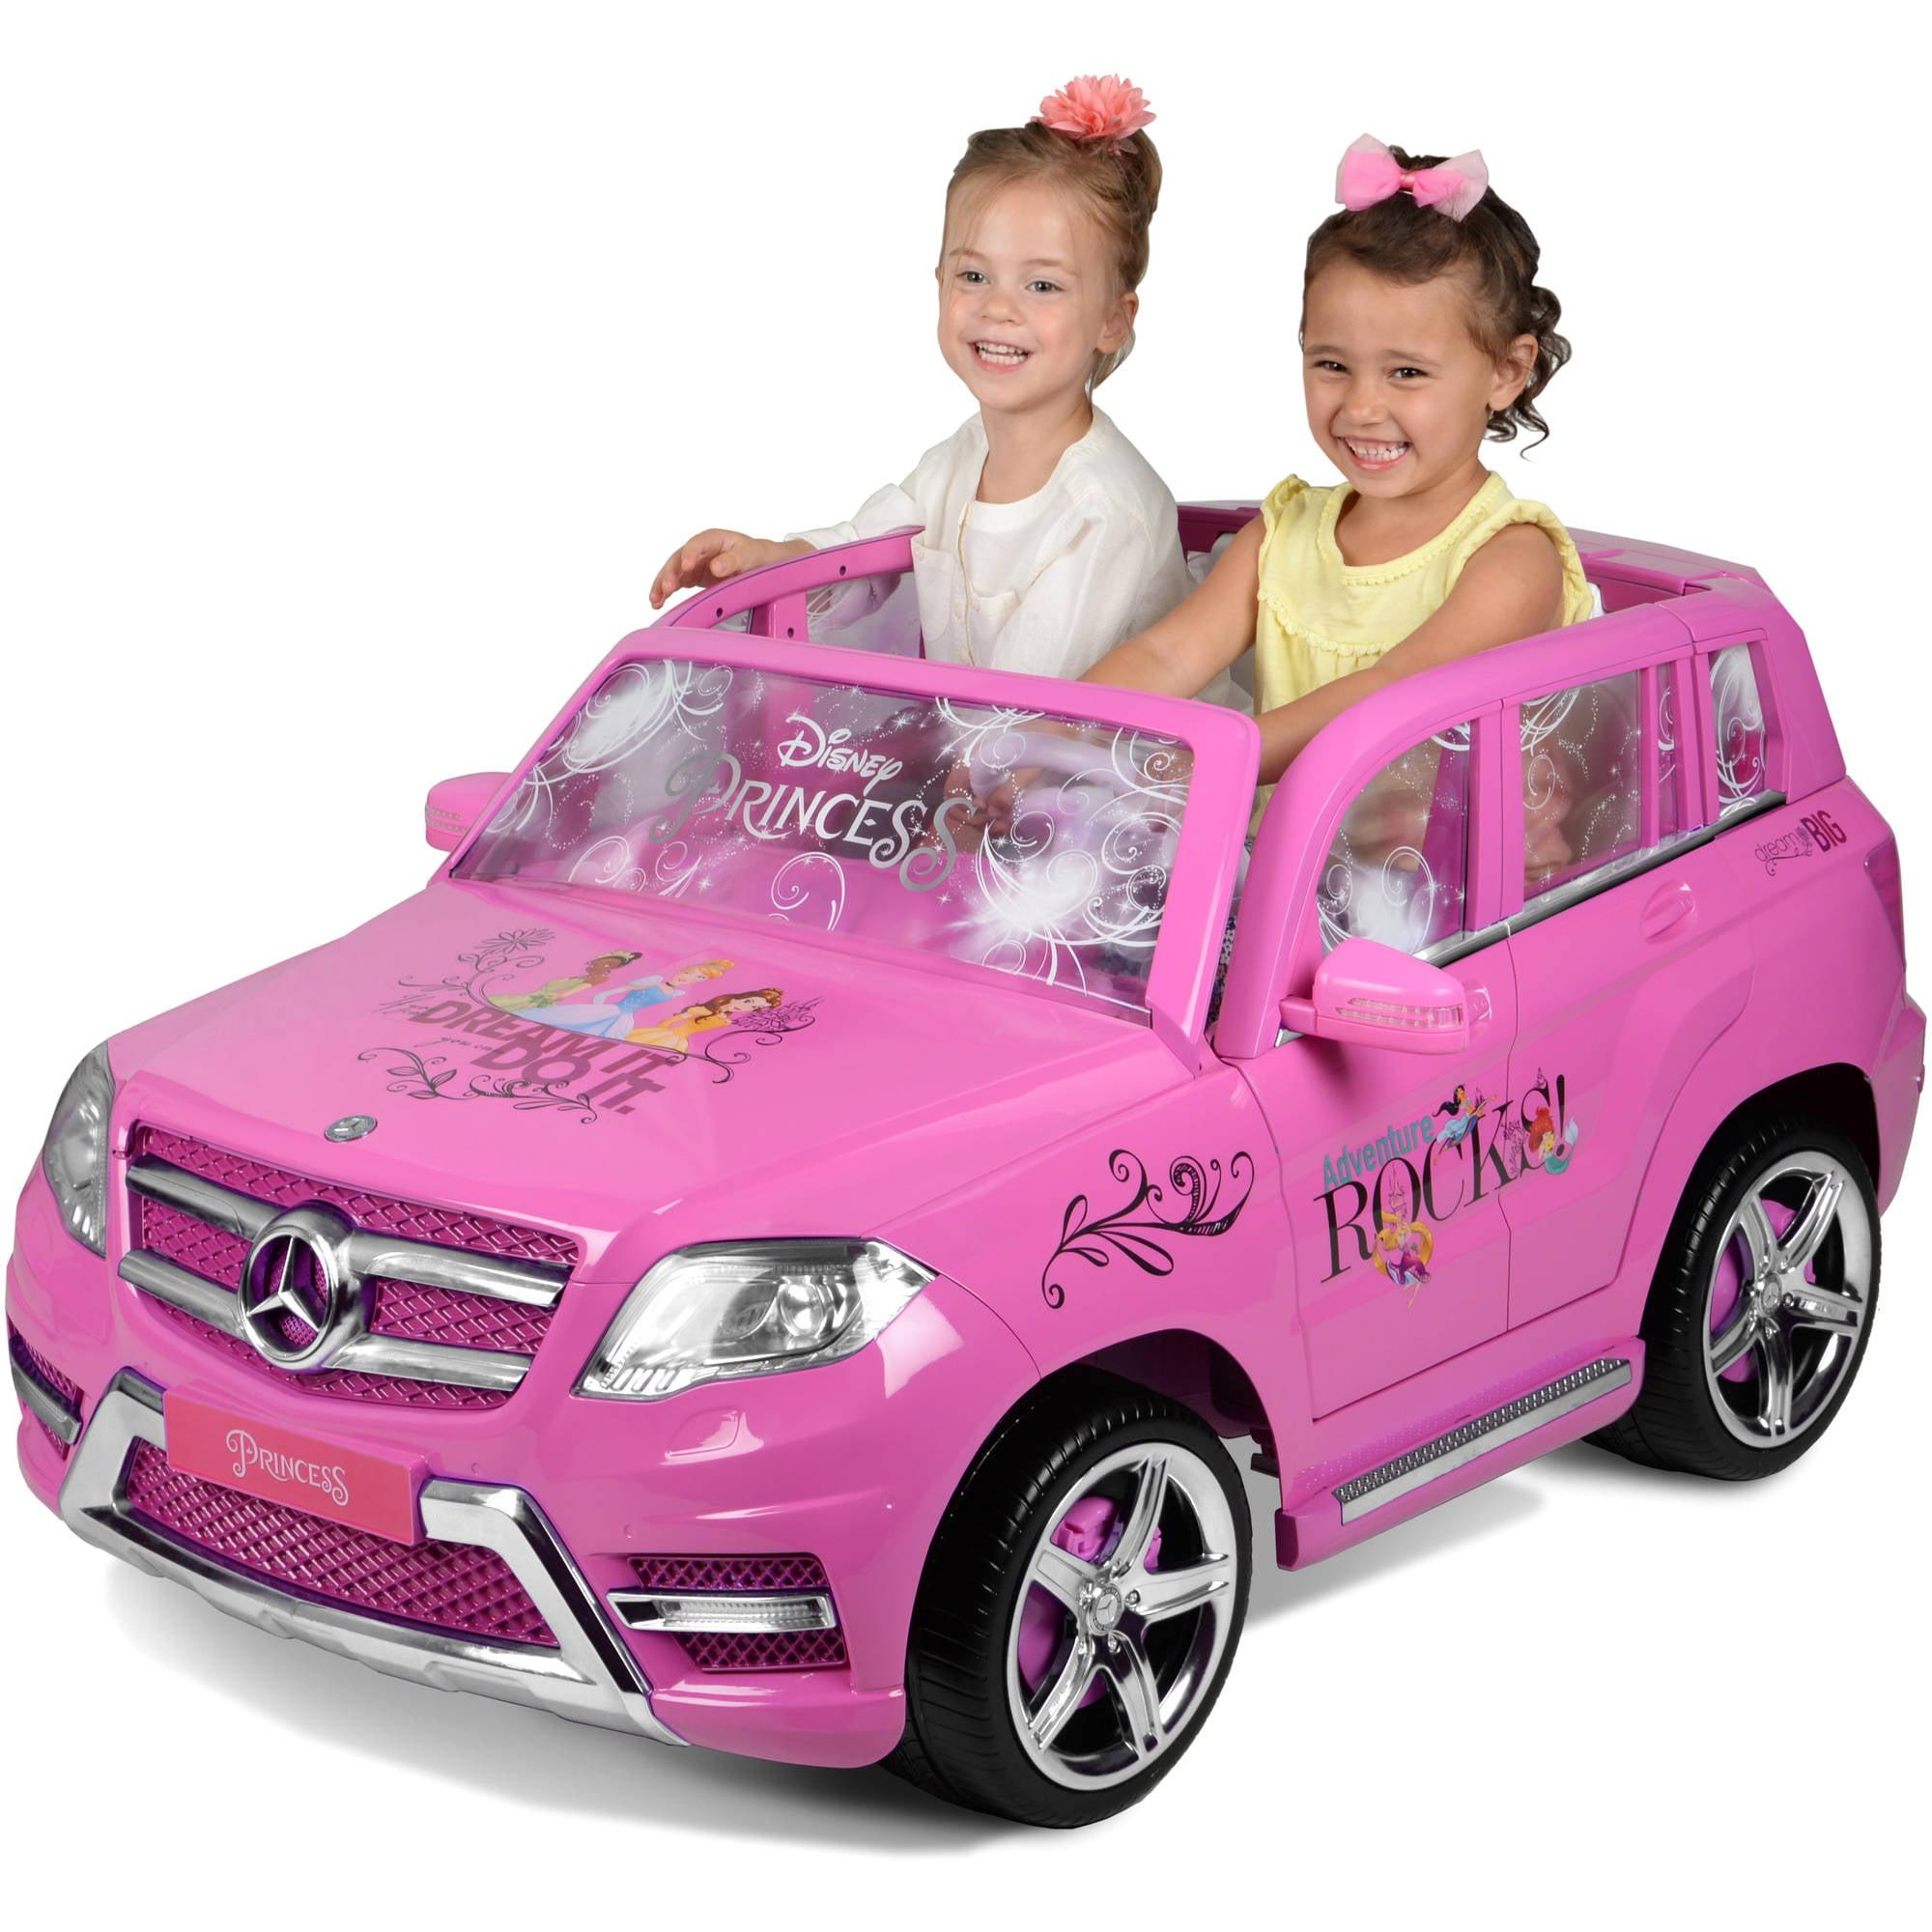 Disney Princess Mercedes 12-Volt Ride-On by Ballard Pacific Resources